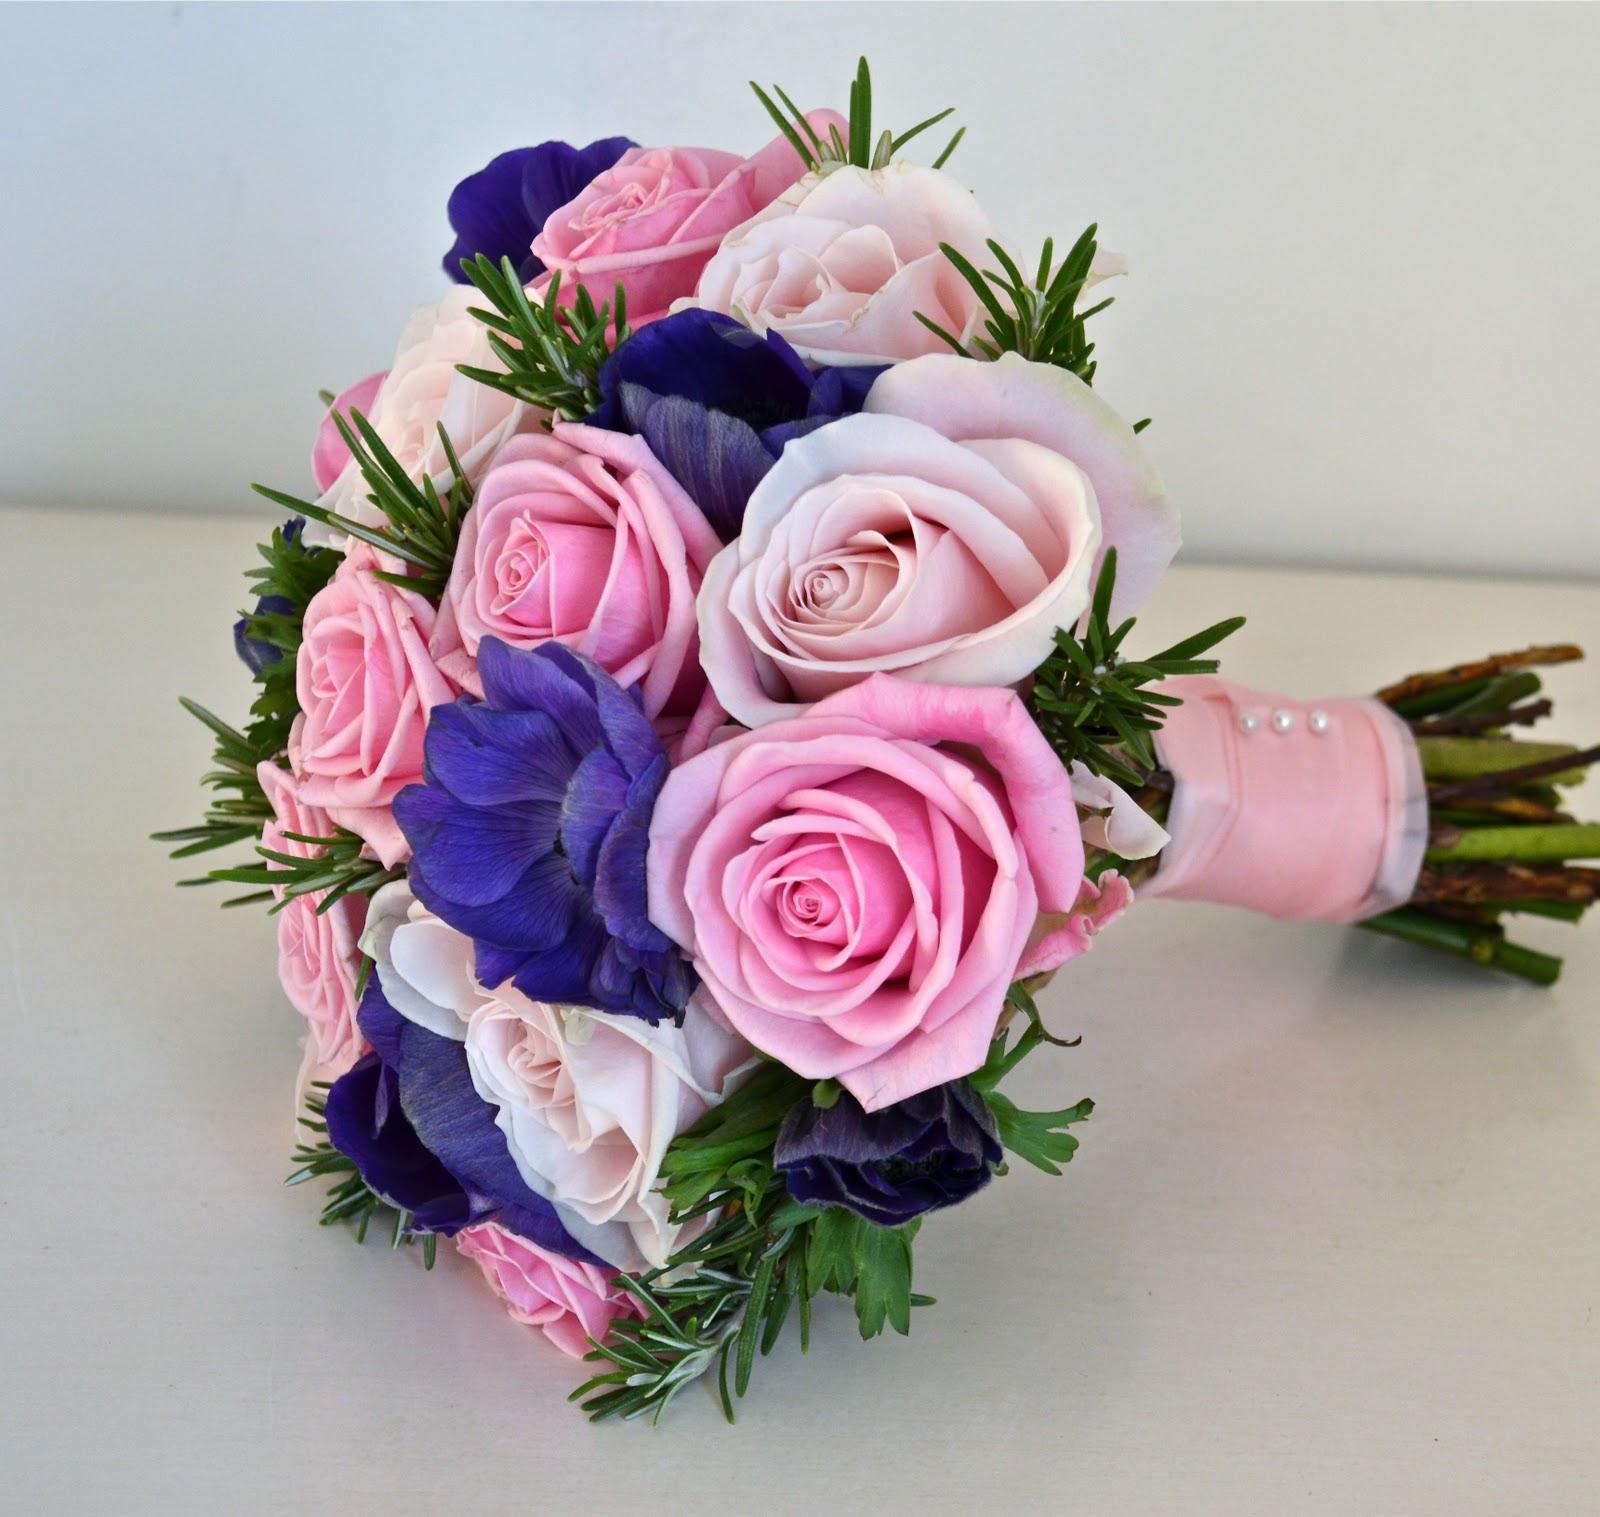 Wedding Flowers Blog: Jonquil\'s Pink and Purple Wedding Flowers